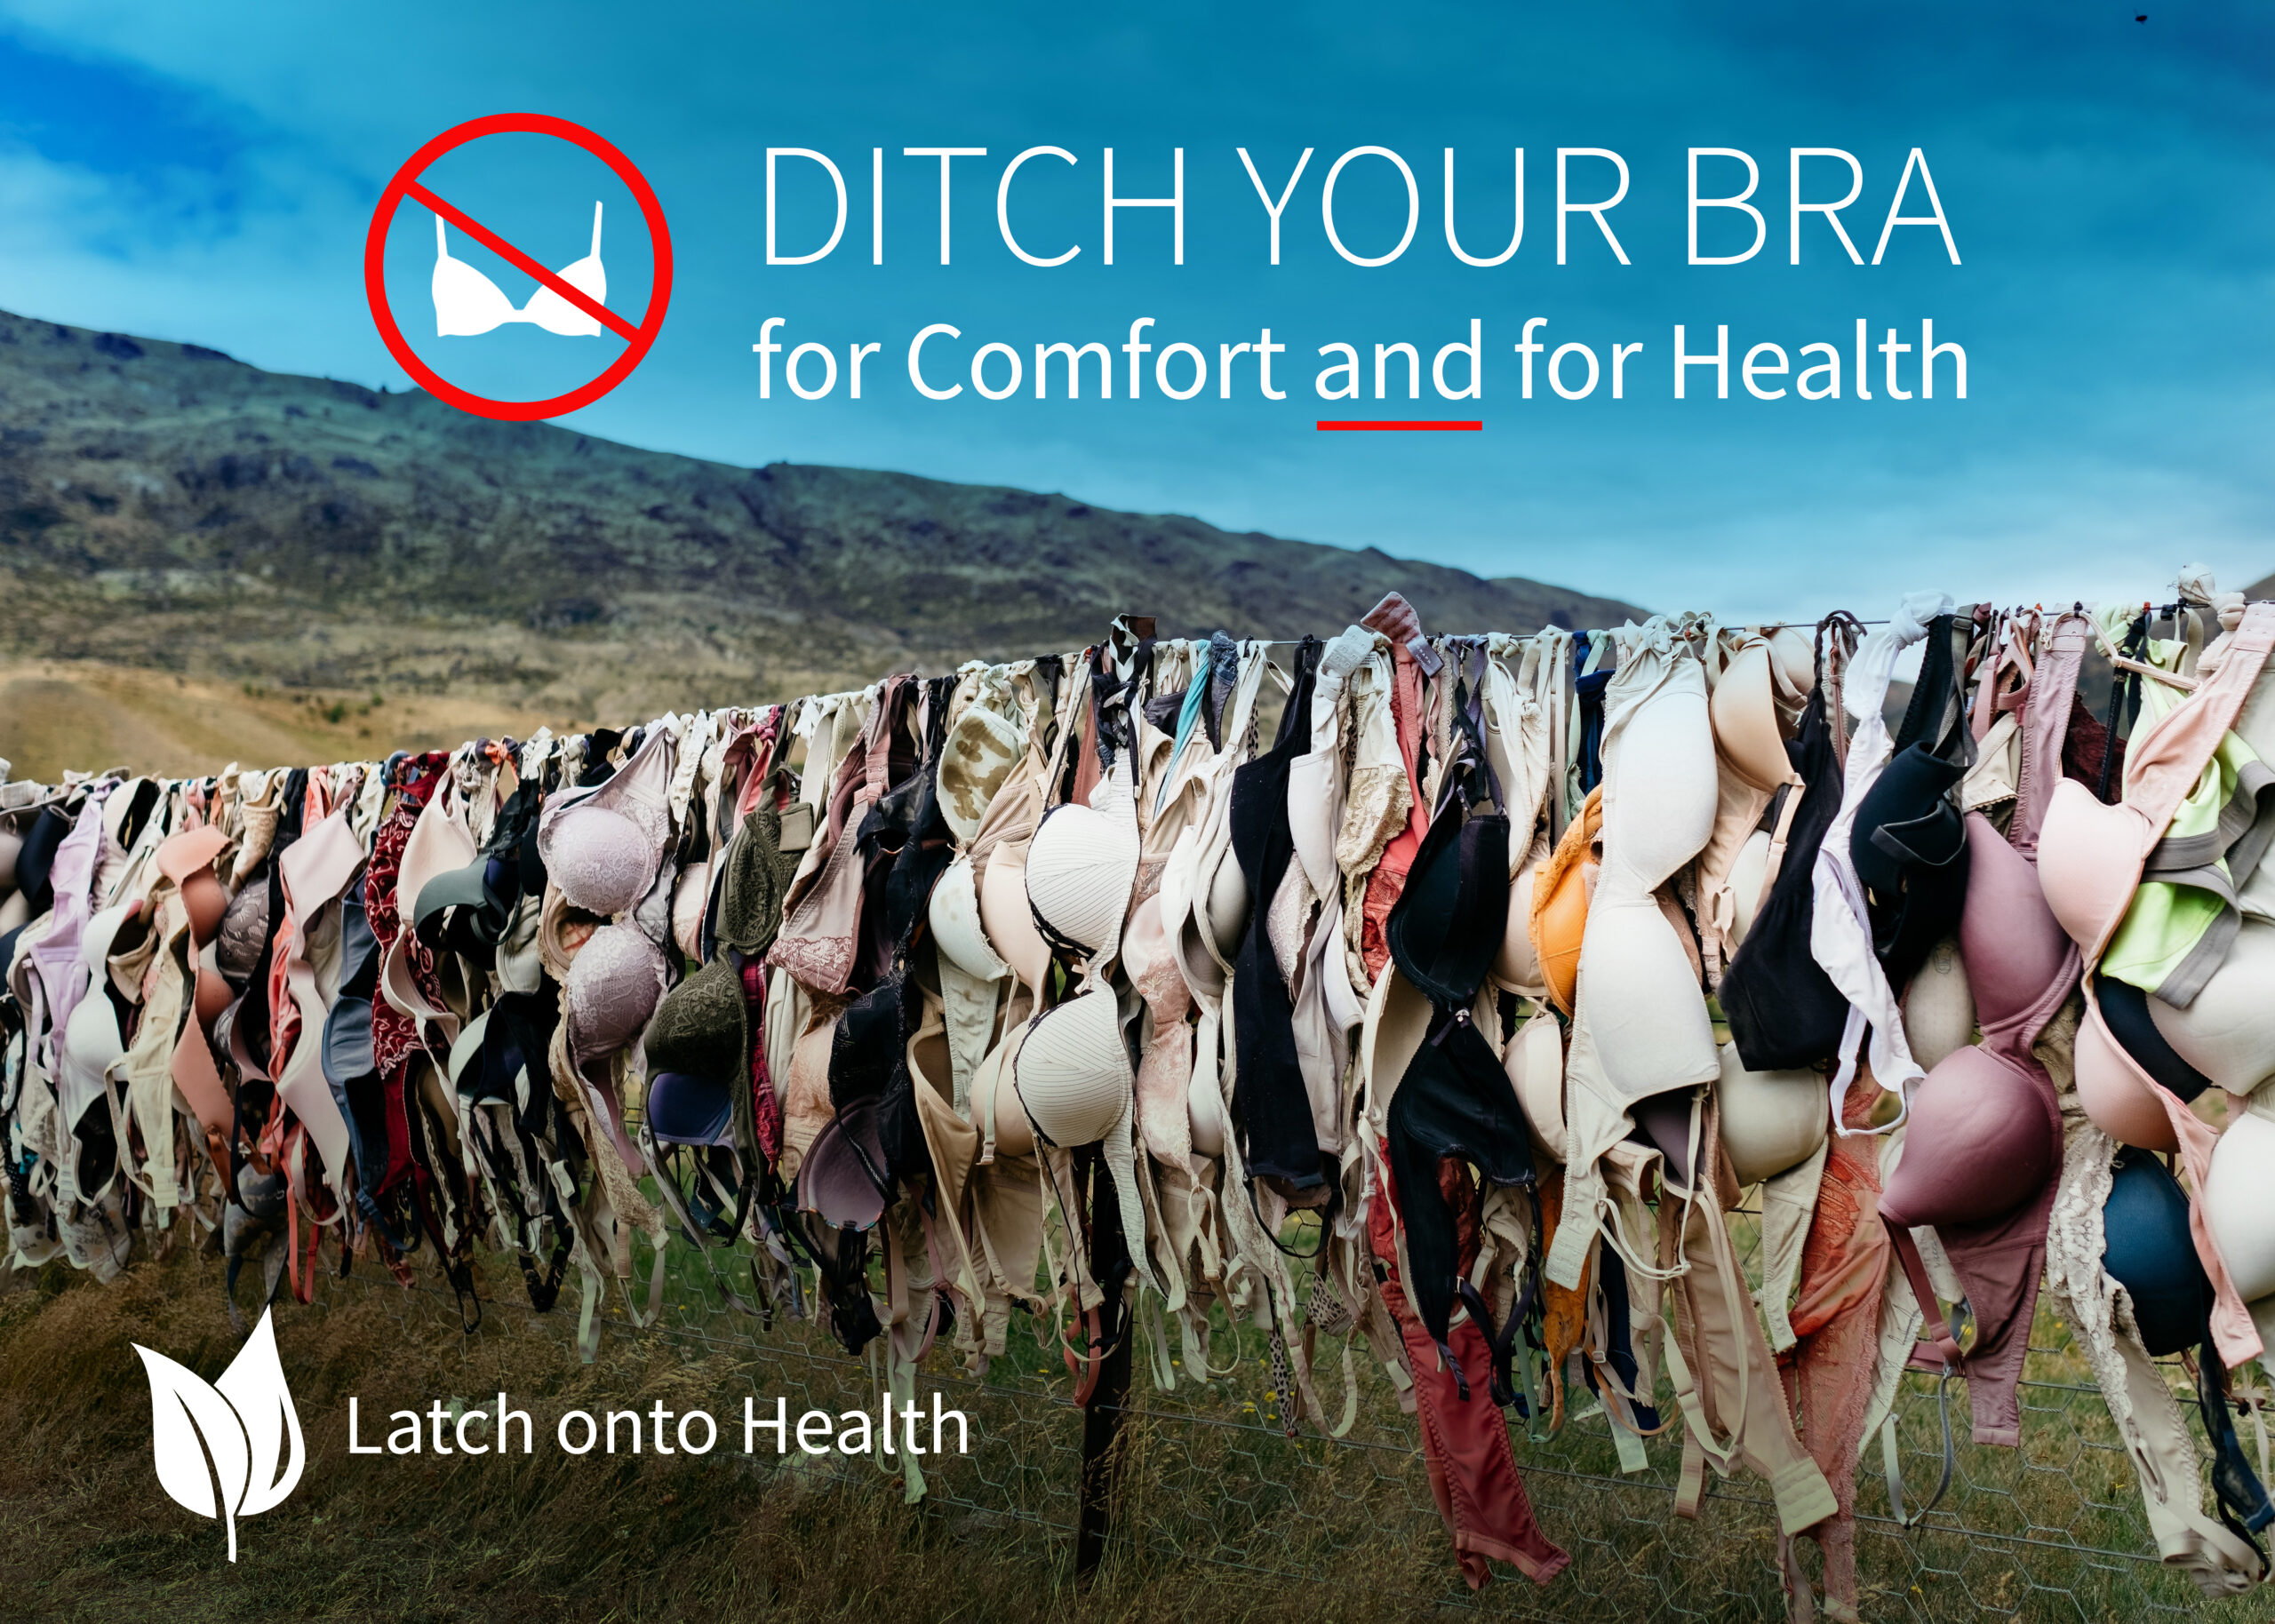 Ditch Your Bra - Latch onto Health